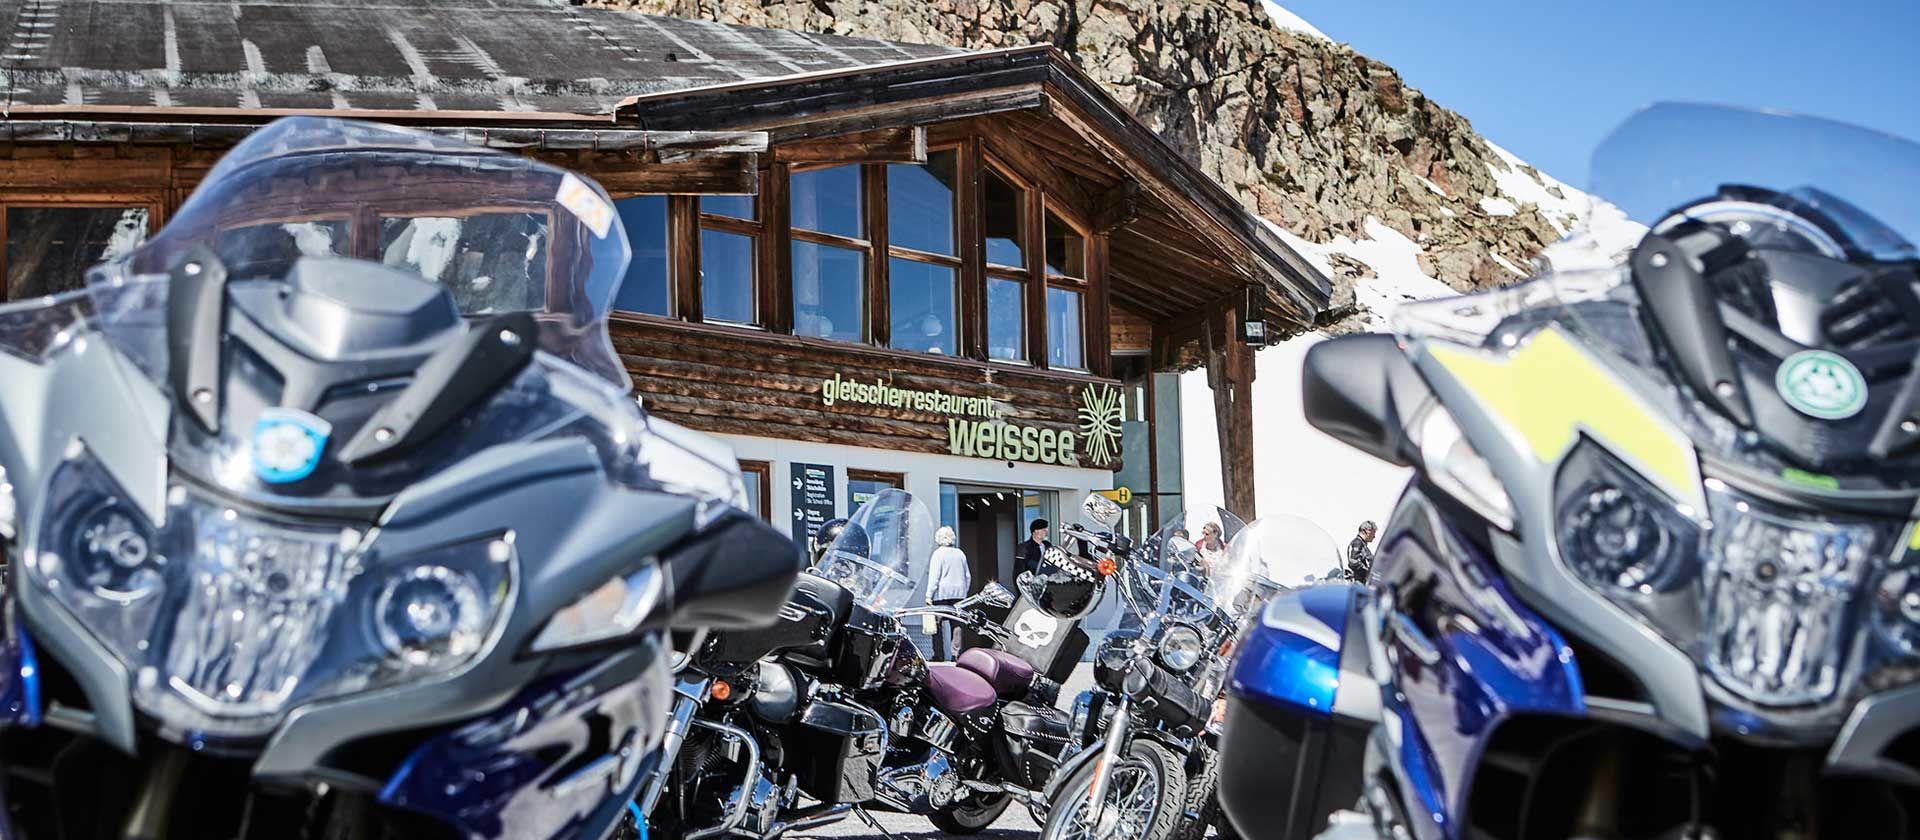 Motorrad im Kaunertal Foto: Kaunertaler Gletscher